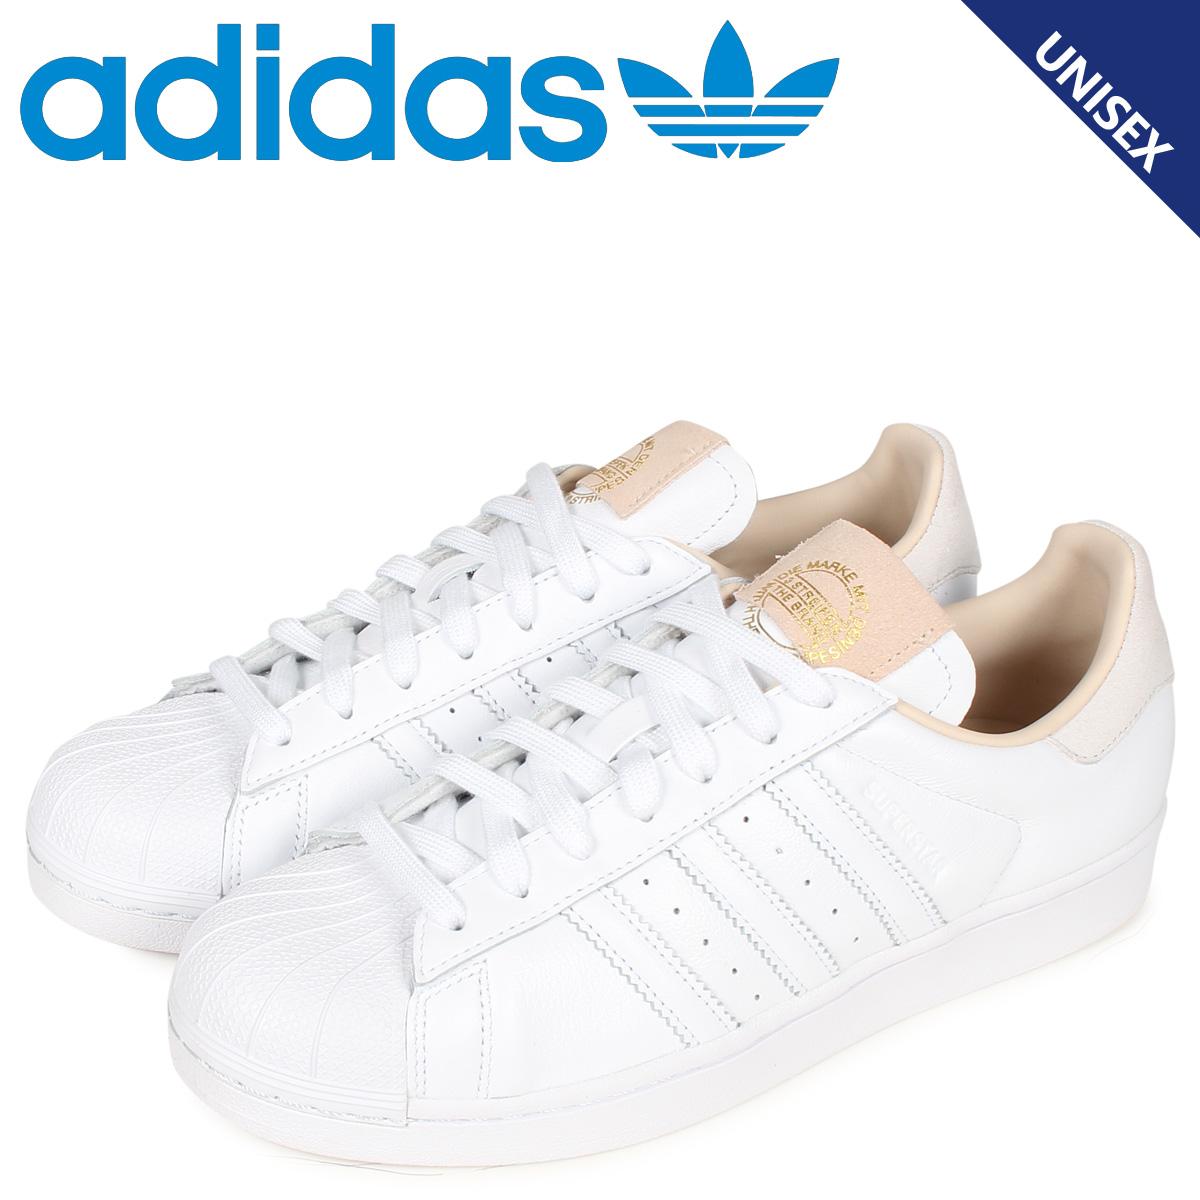 adidas Originals アディダス オリジナルス スタンスミス スニーカー メンズ レディース STAN SMITH ホワイト 白 EF2102